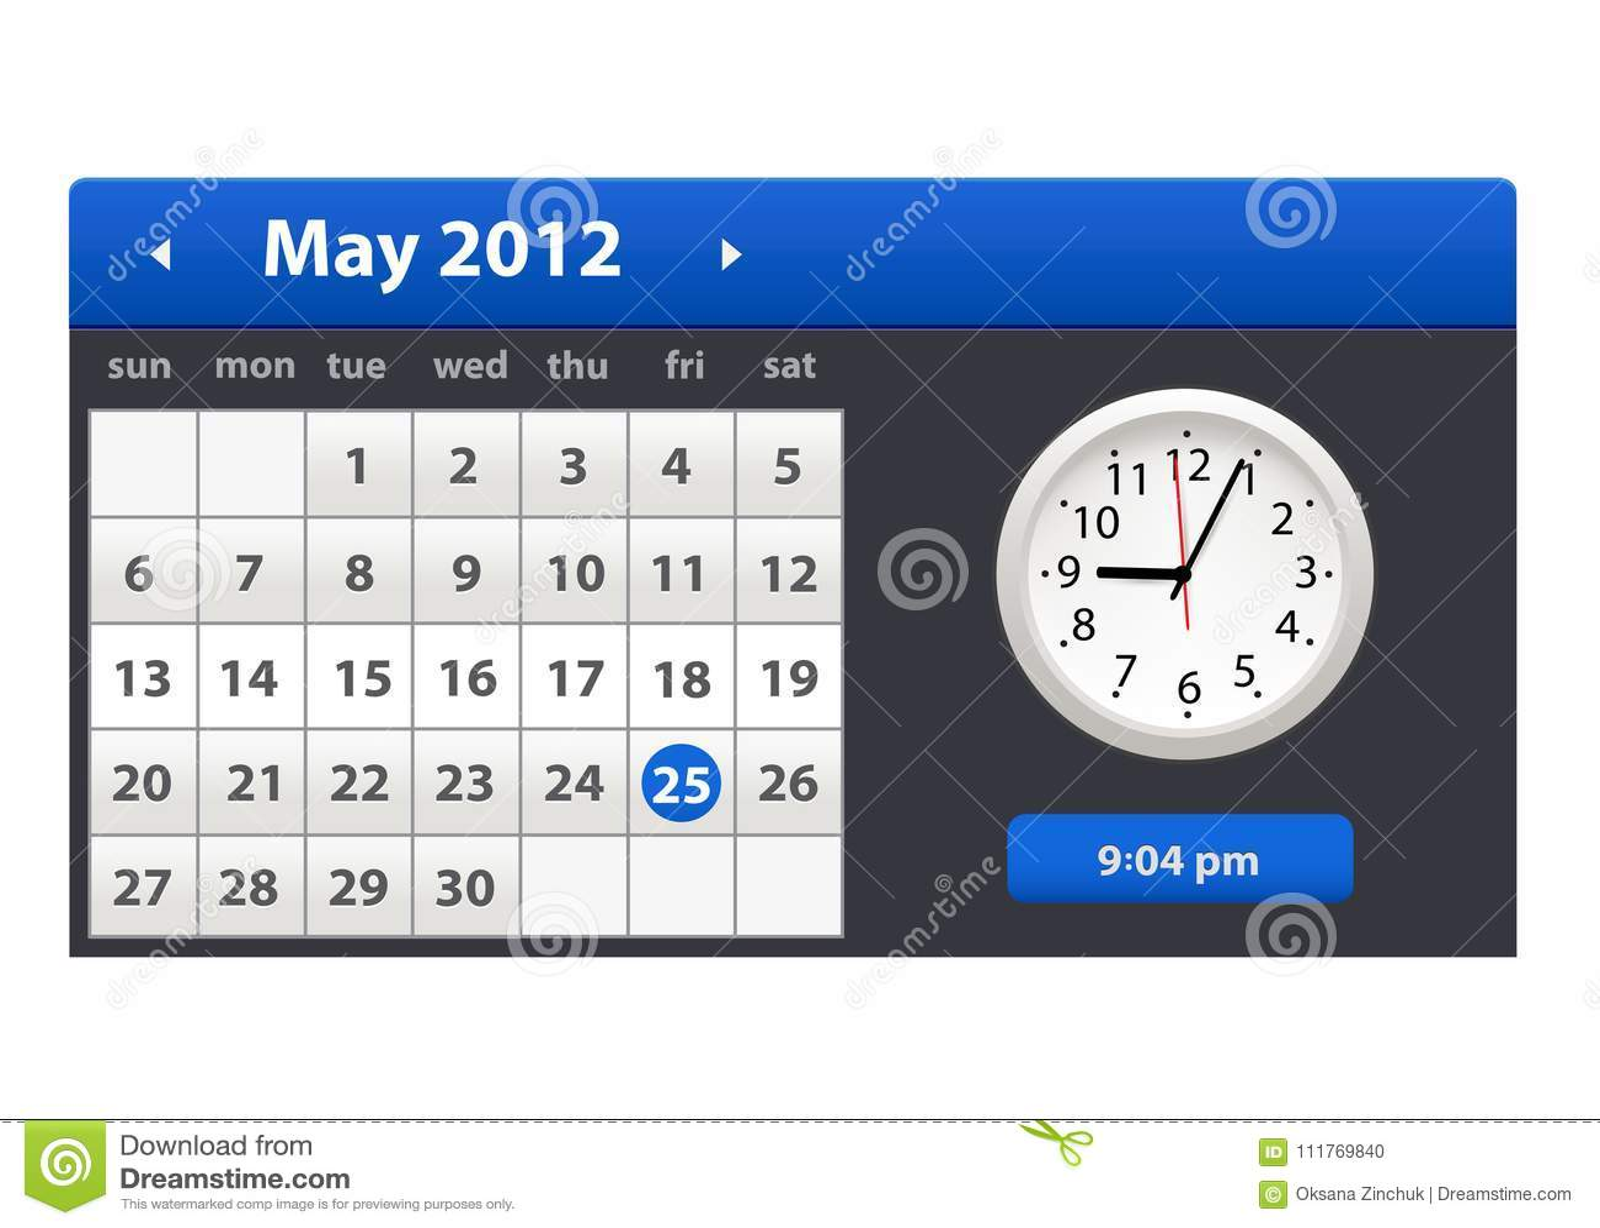 Elegant Desk Calendar Design : Desk calendar simple colorful gradient minimal elegant